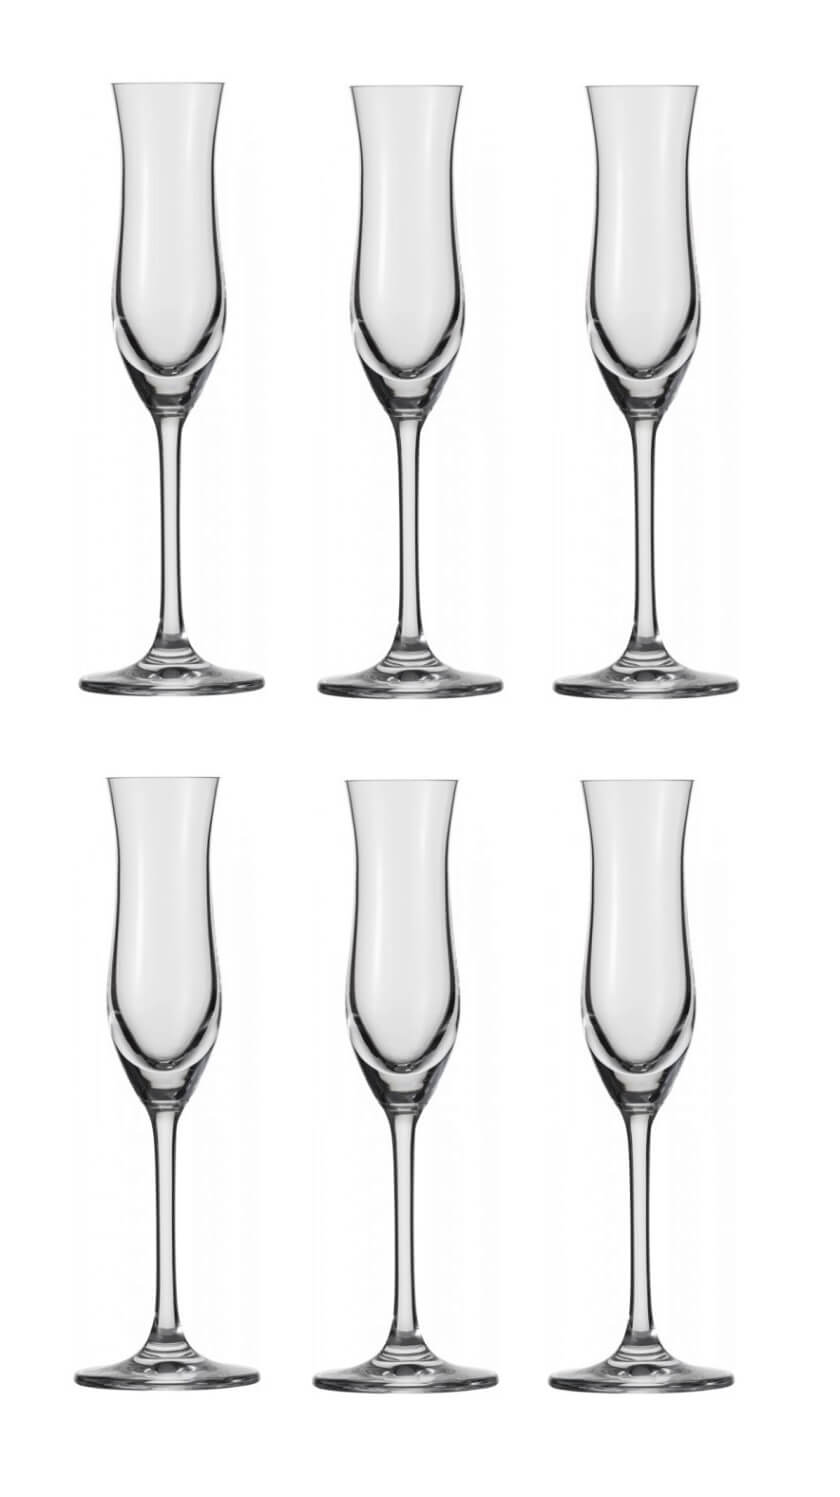 Онлайн каталог PROMENU: Набор бокалов для крепкого алкоголя Schott Zwiesel Digestiv,  объем 0,064 л, 6 шт.                               120221_6шт